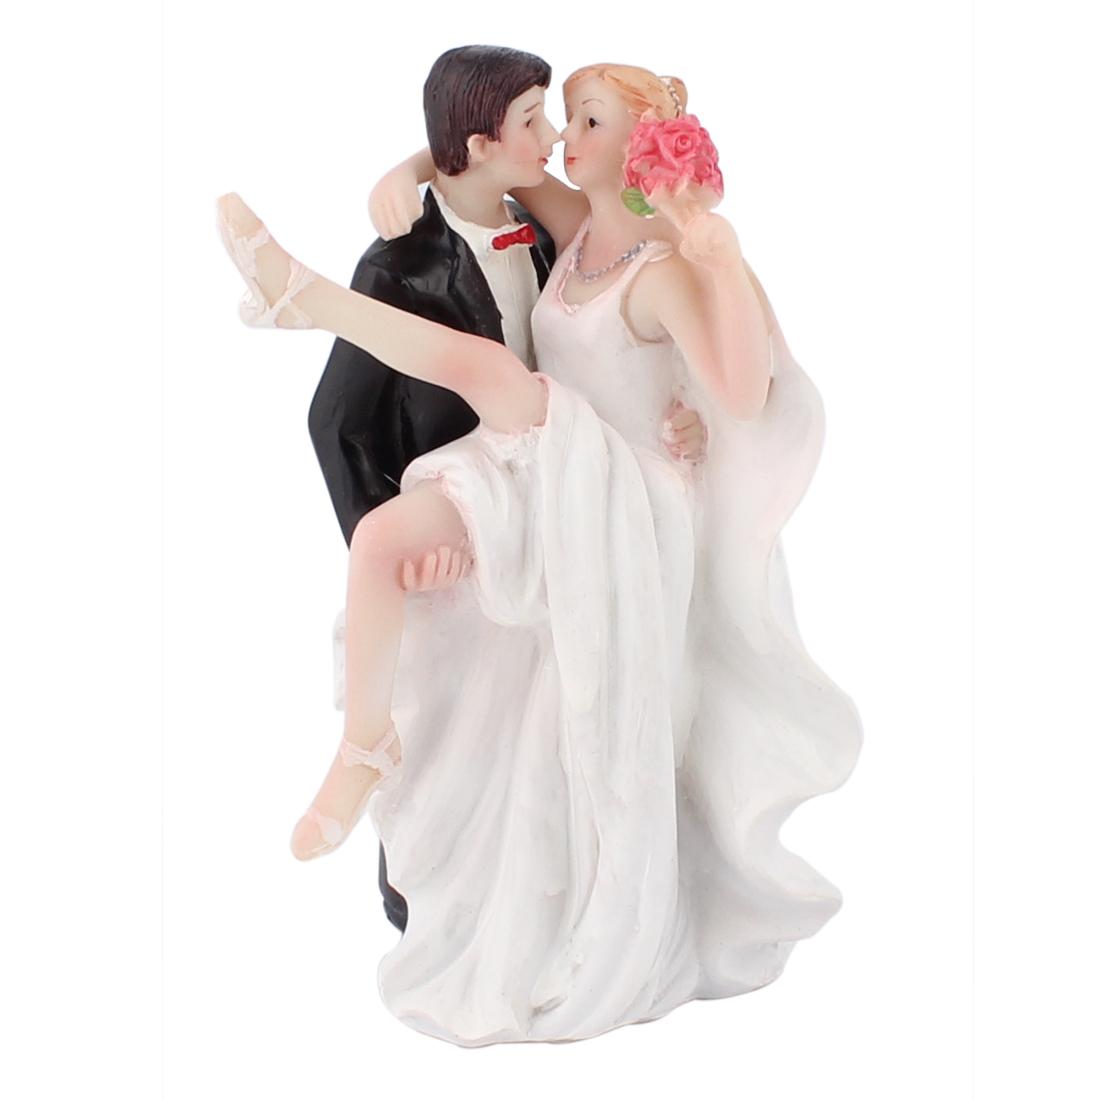 Bride Groom Couple Hug Kiss Figurine Wedding Cake Topper Decoration Gift Favor